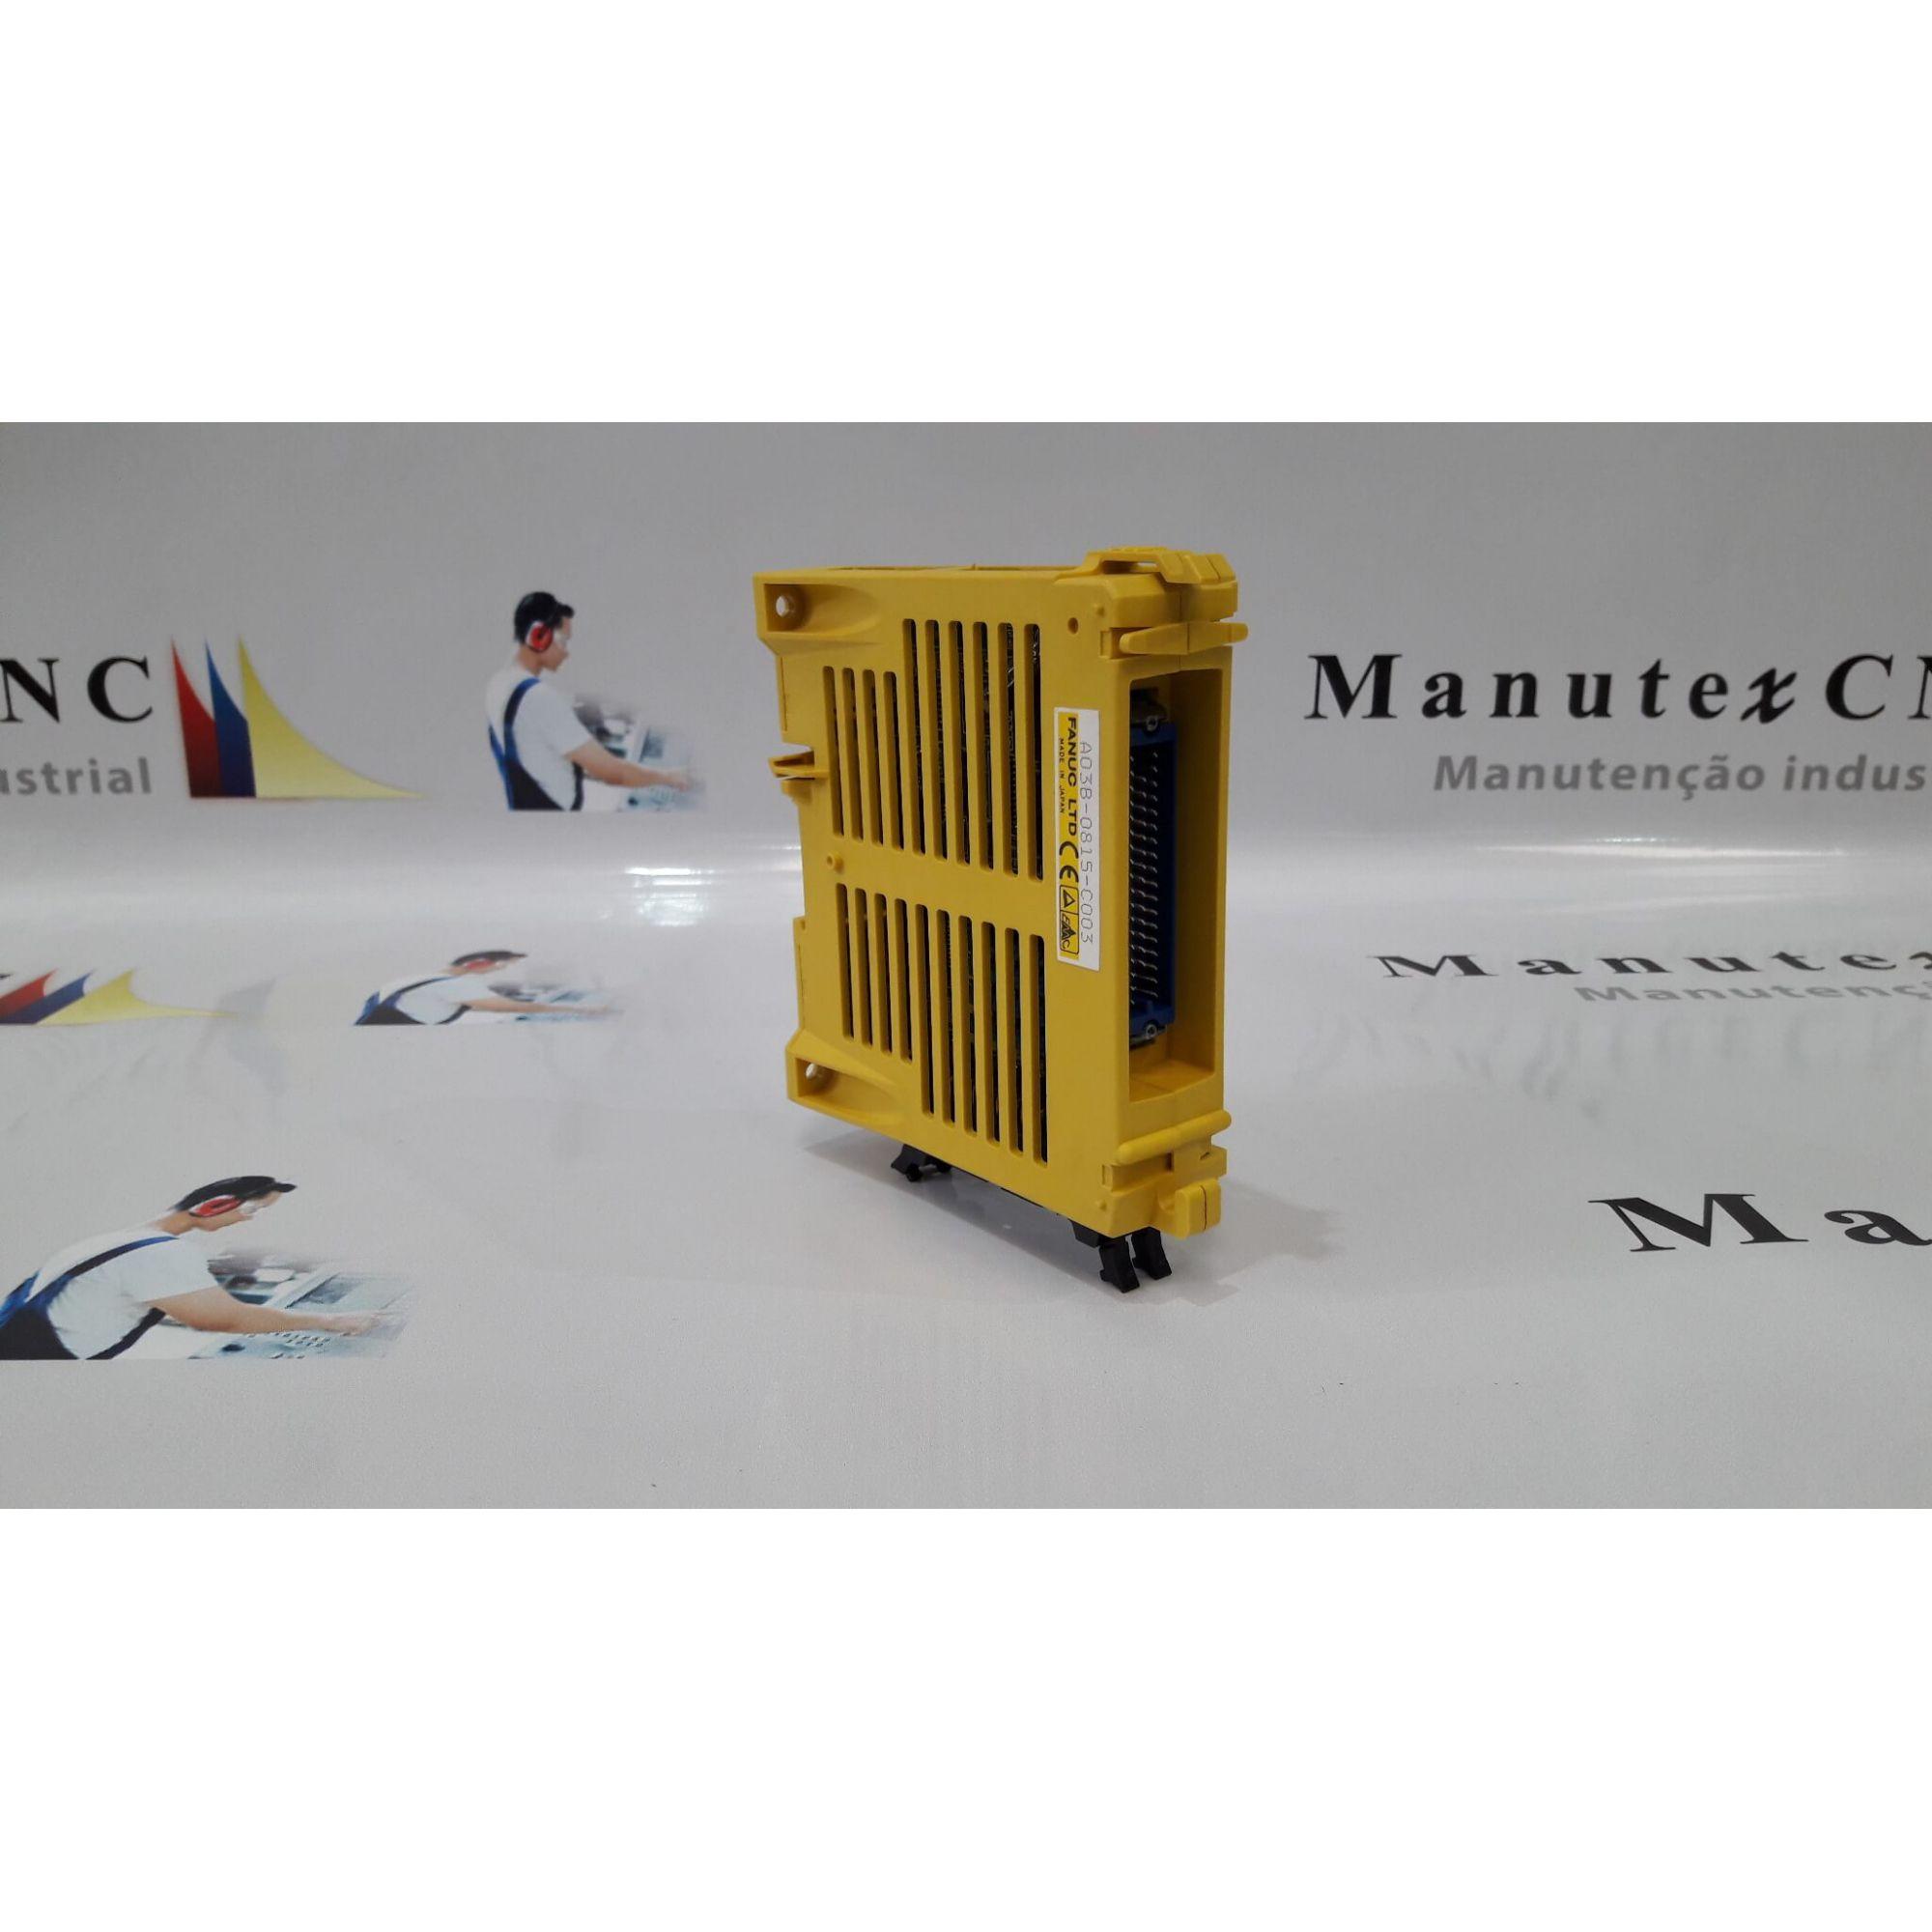 A03B-0815-C003 | MODULO I/O | FANUC